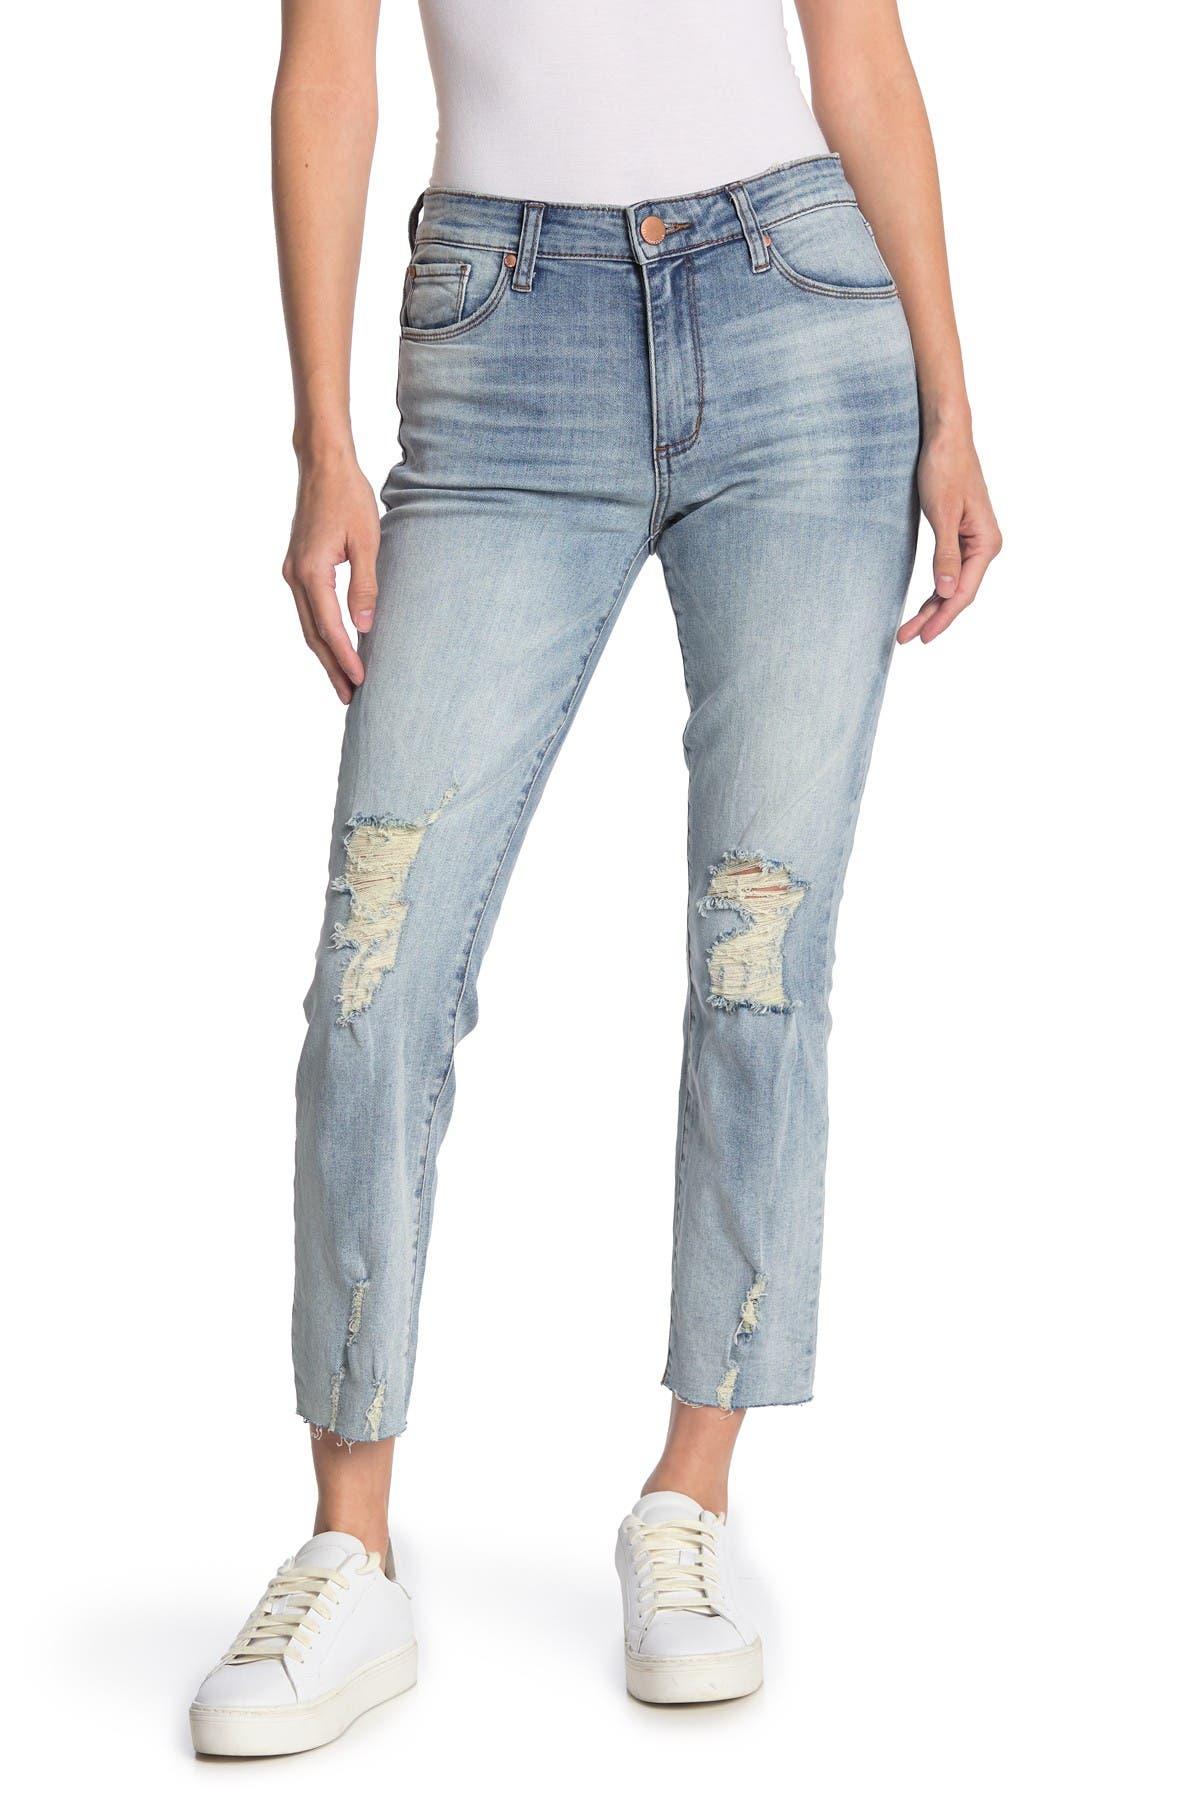 Image of STS BLUE Caroline Distressed Straight Leg Jeans